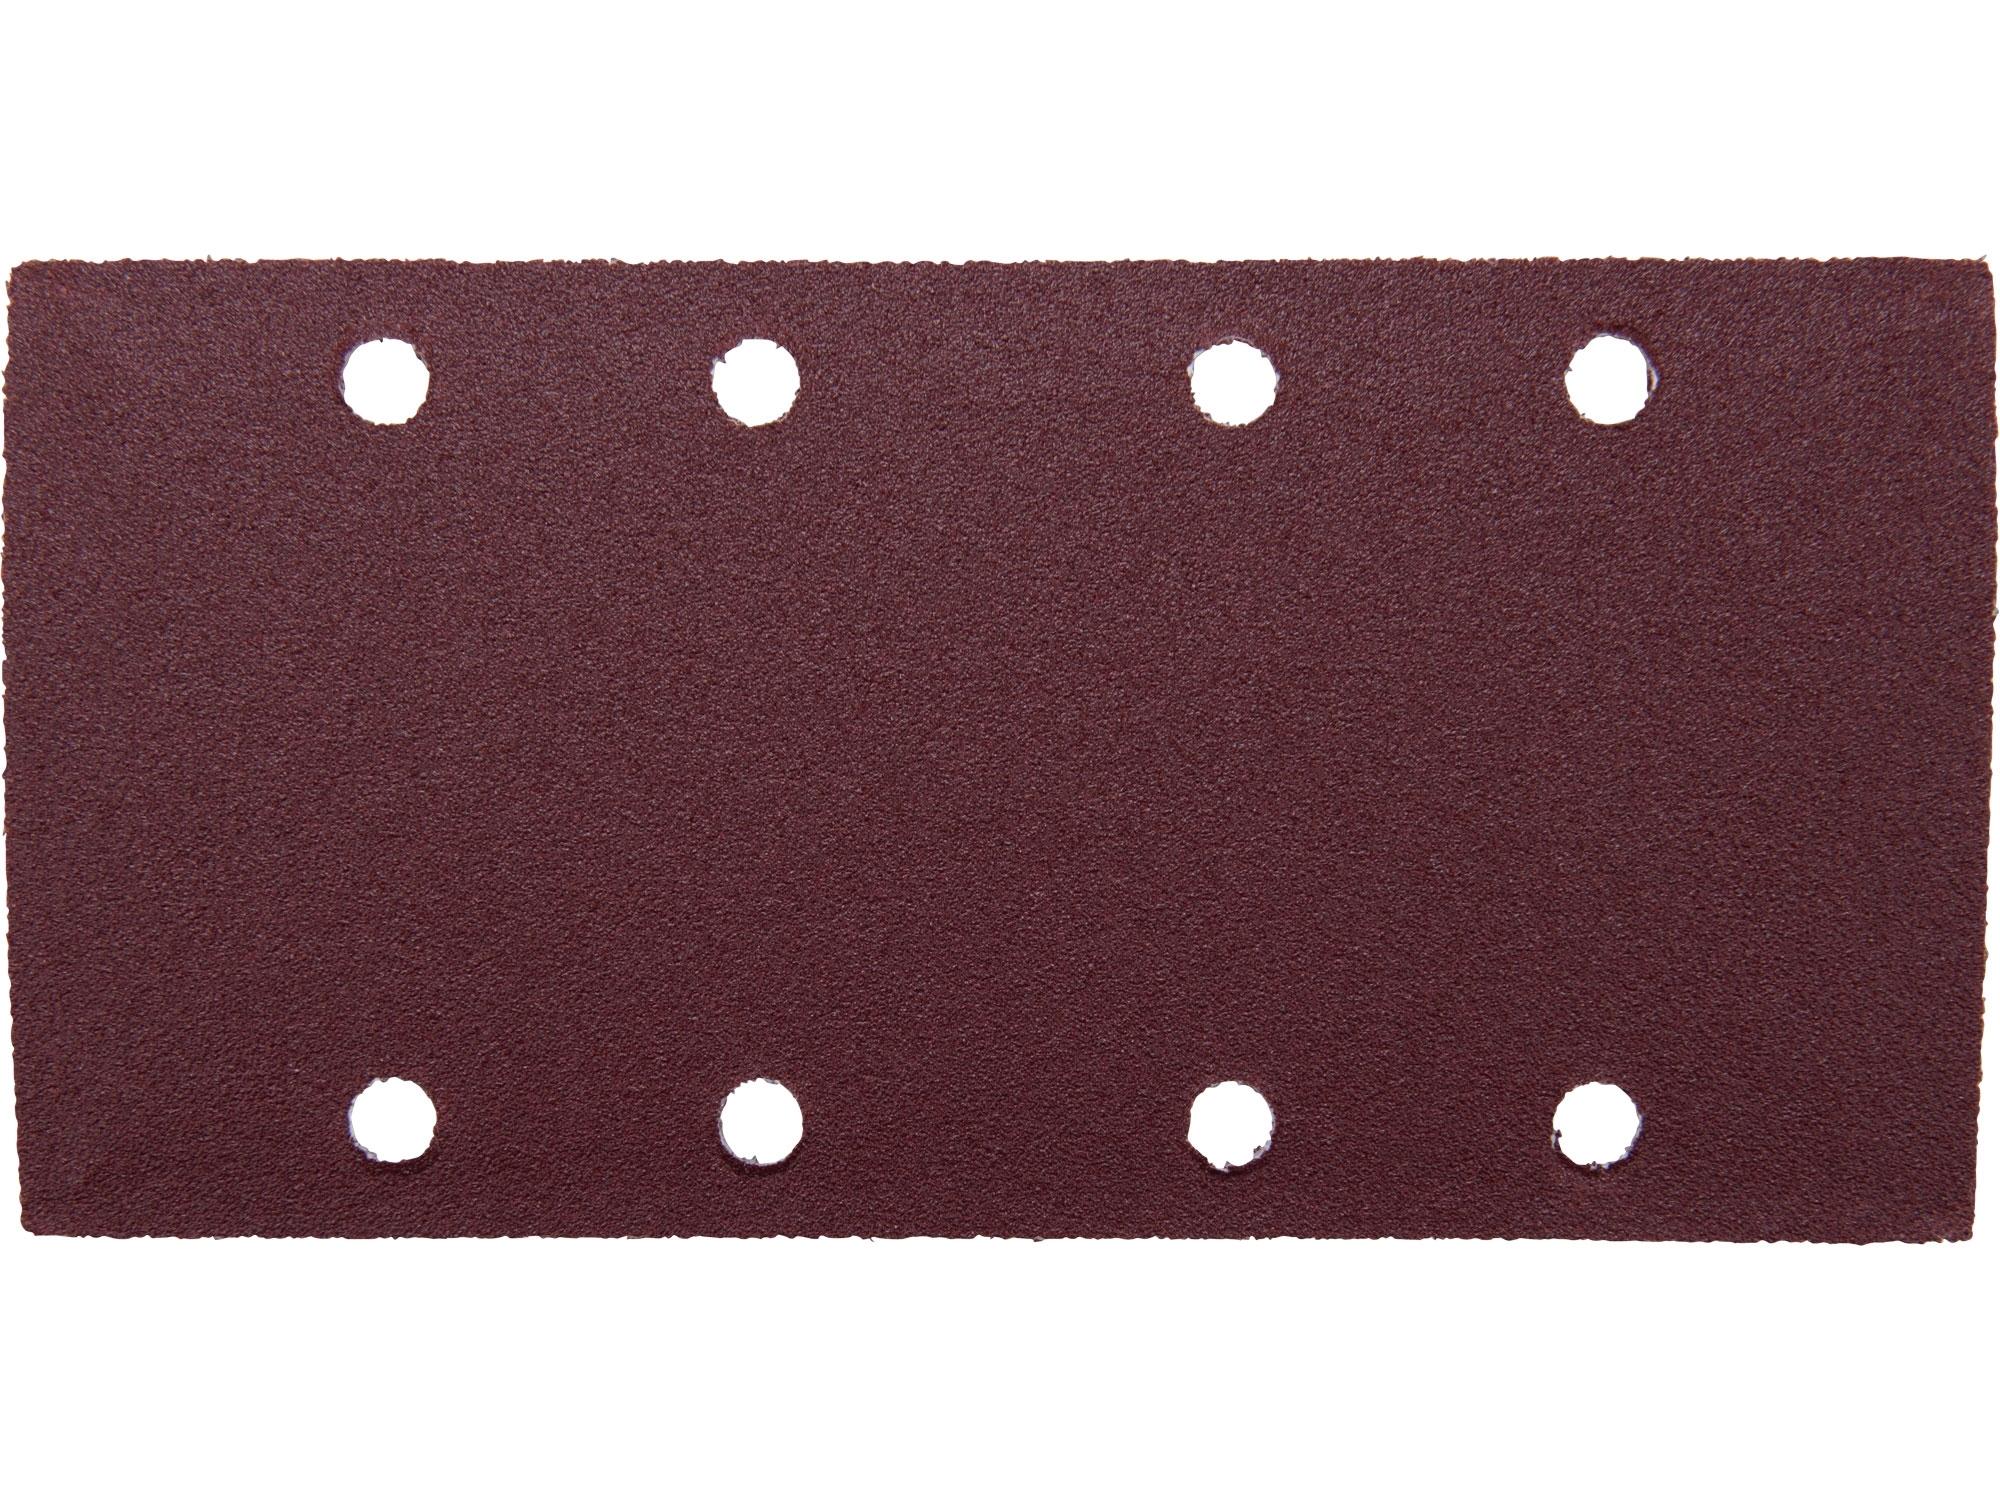 papíry brusné, suchý zip, bal. 10ks, 93x185mm, P100